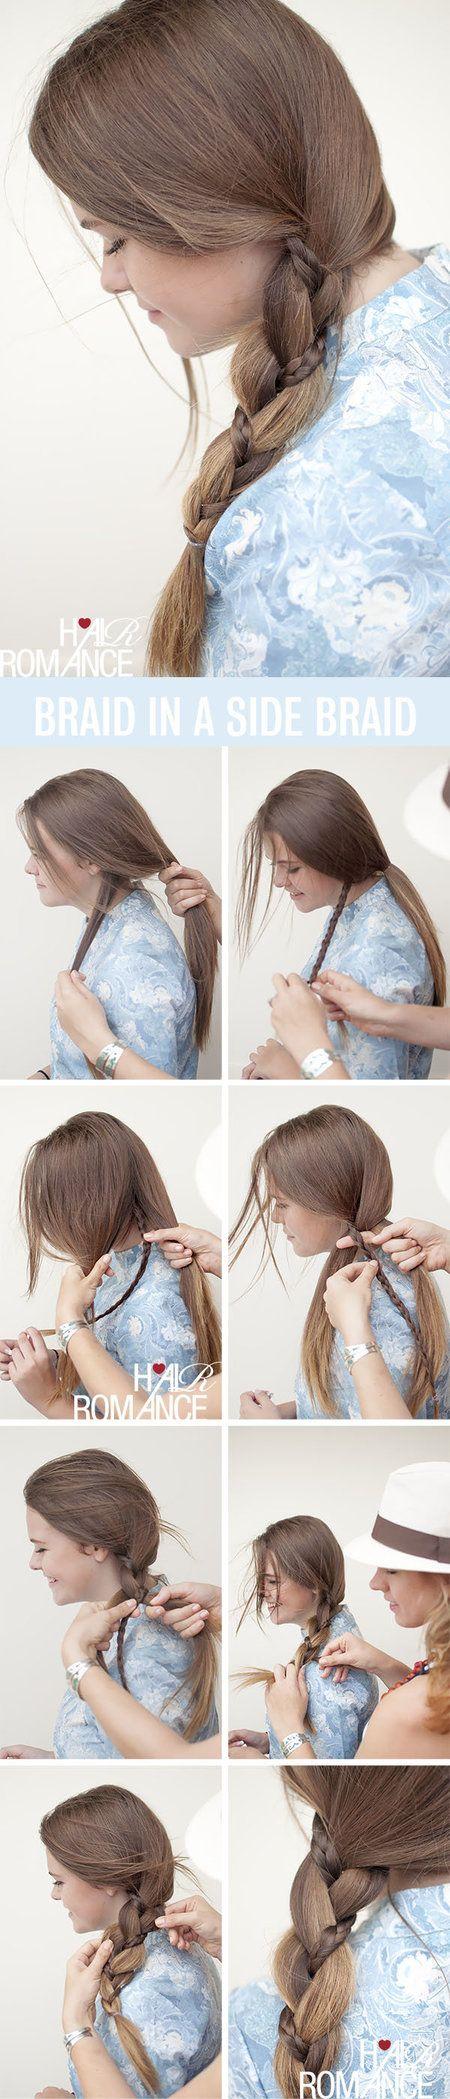 Pictorial - Braid inside a side braid tutorial! #harstyle #braidedhair #longhair - bellashoot.com